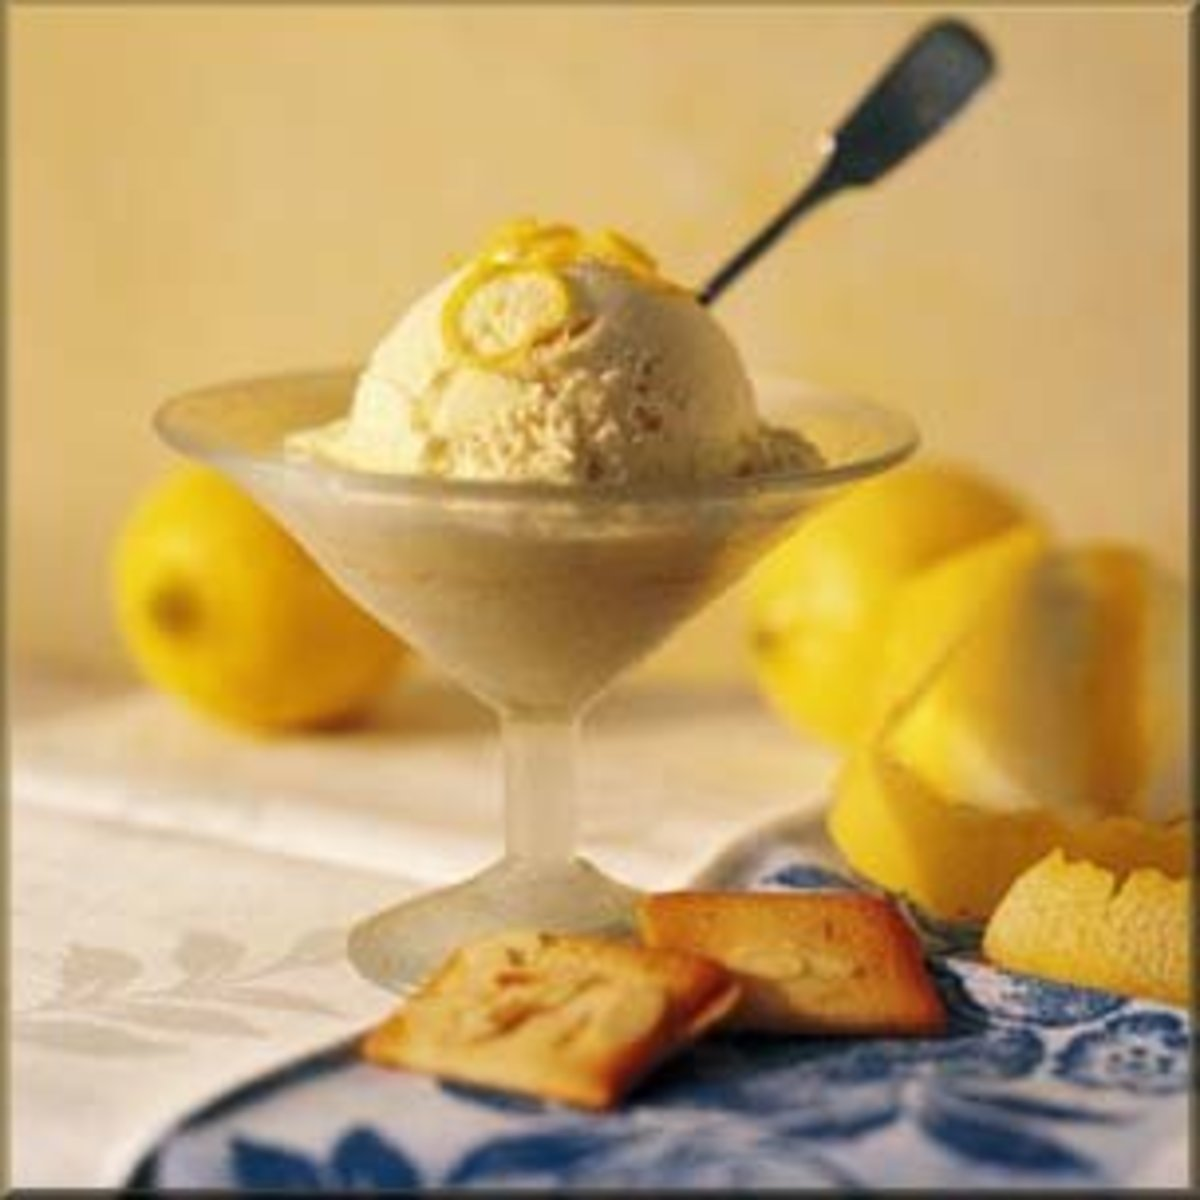 gelato_vs_ice_cream_vs_frozen_yogurt